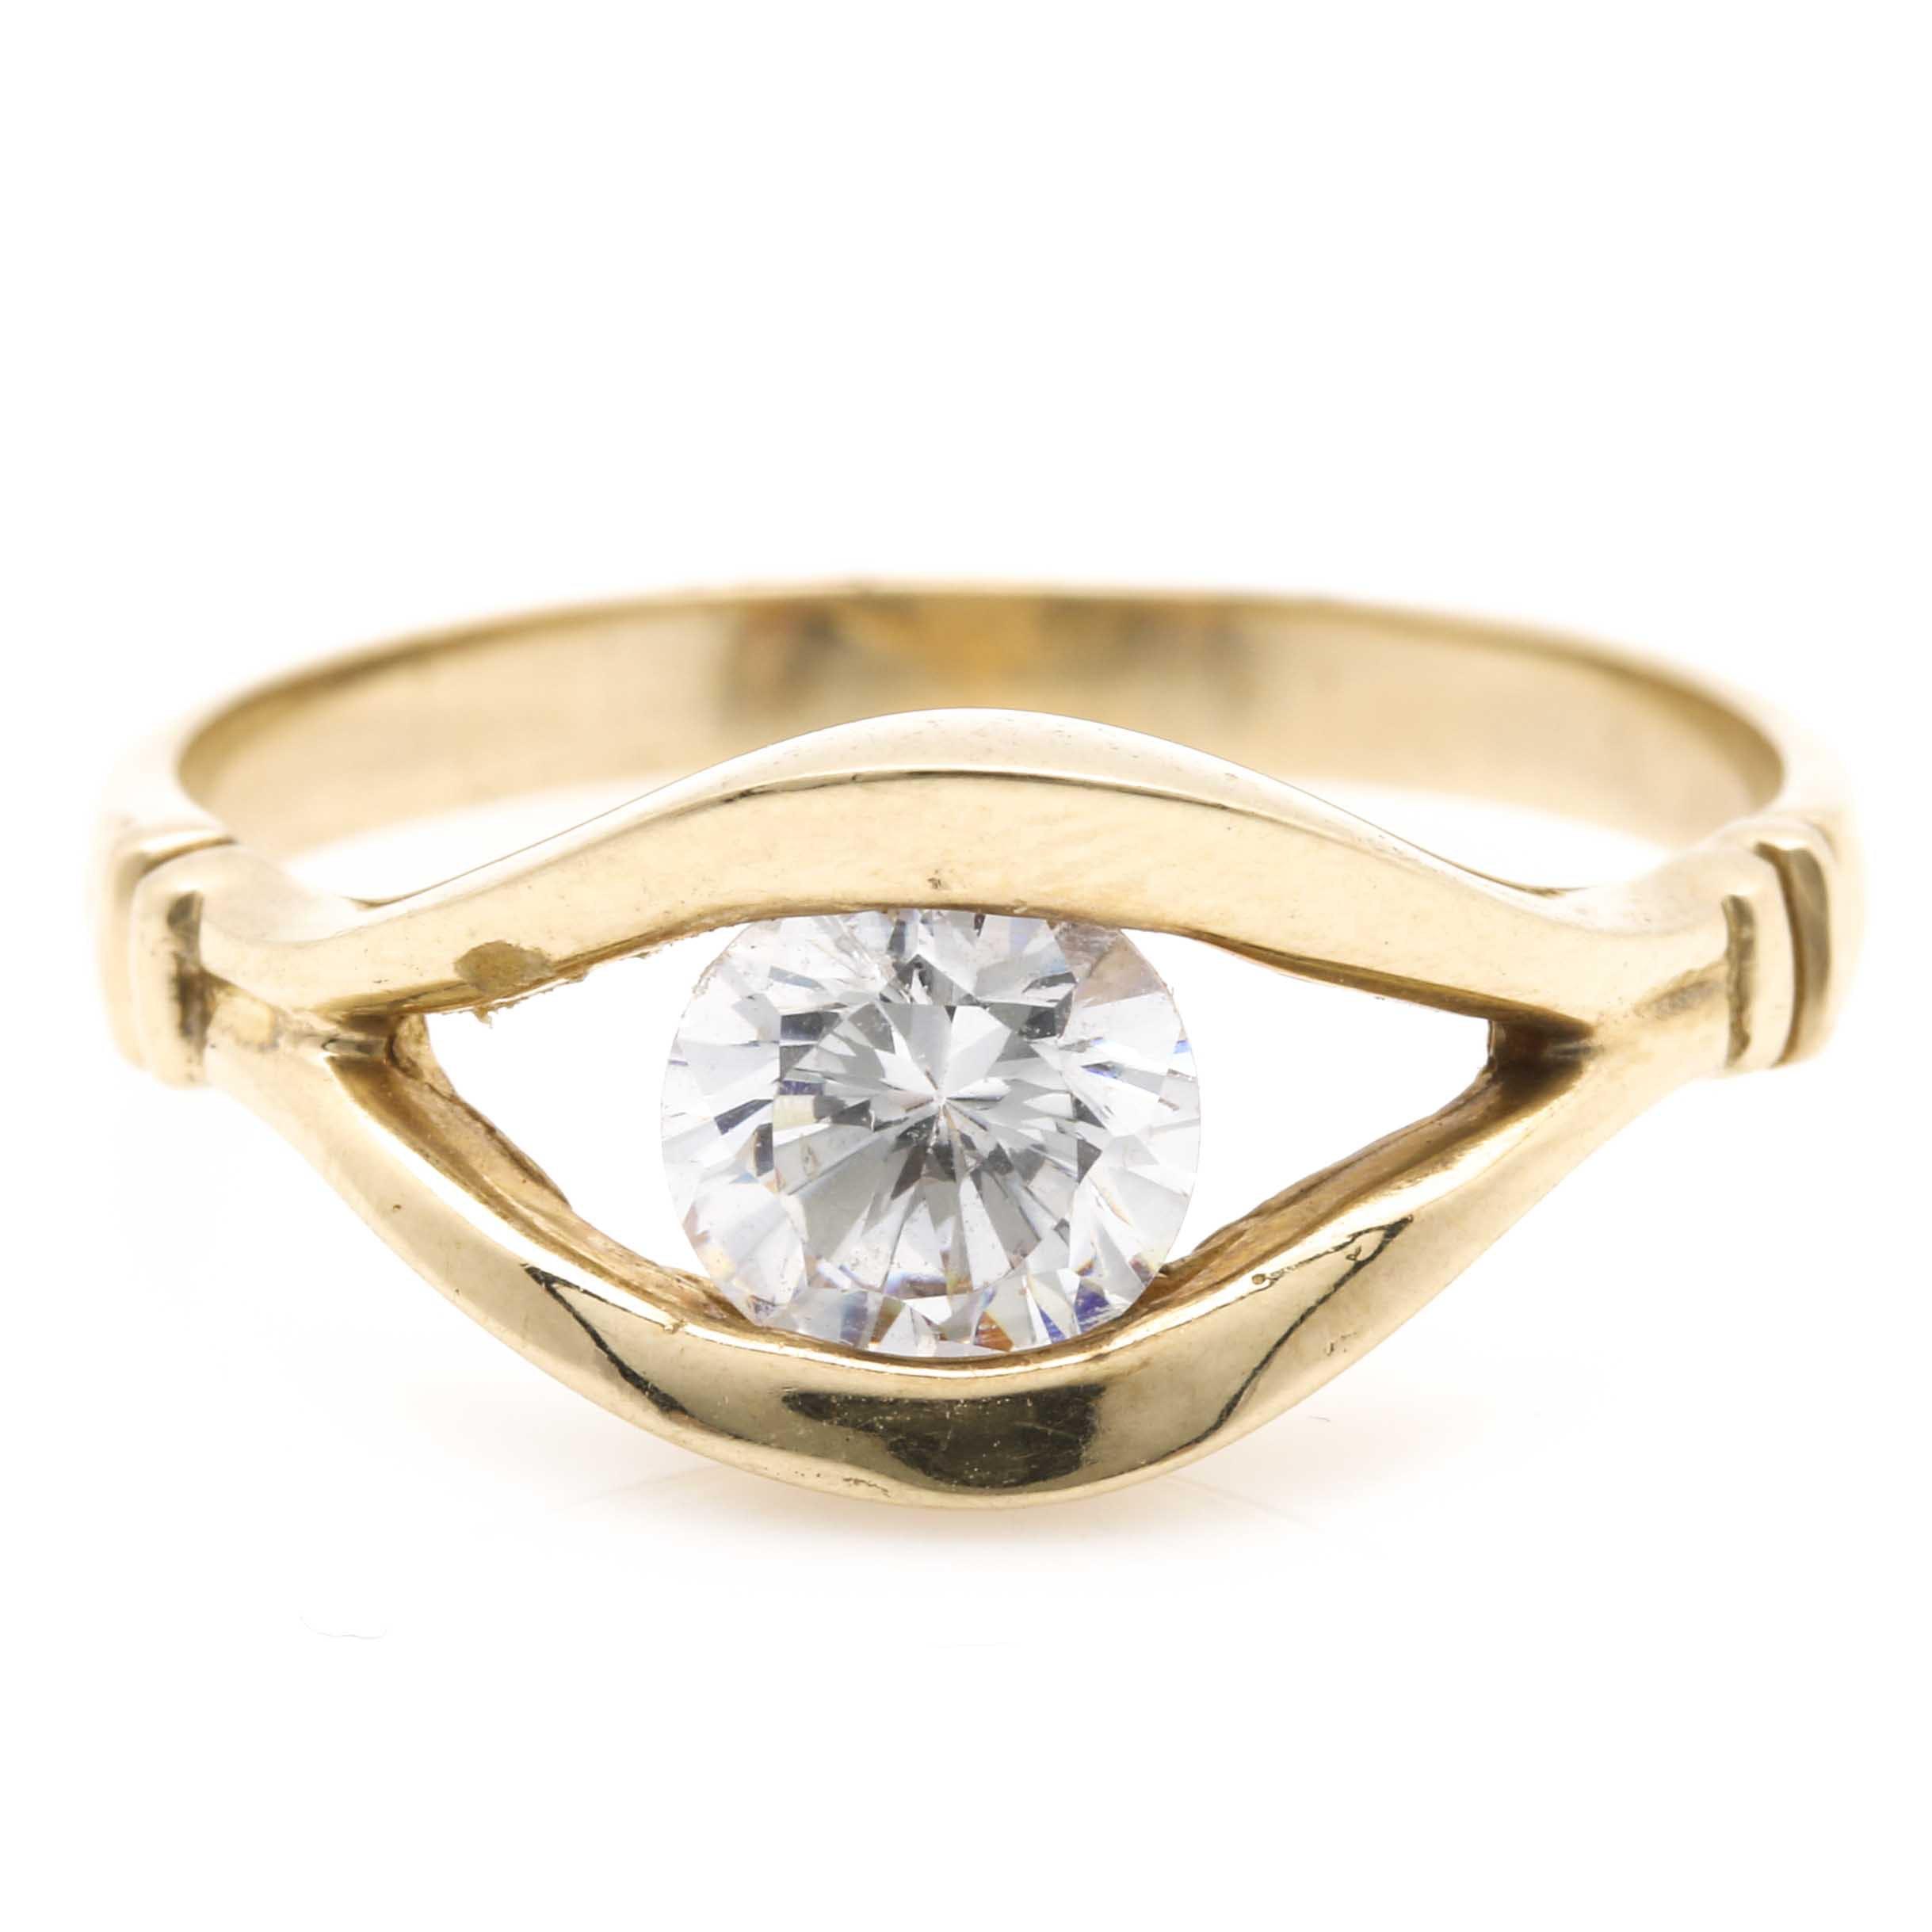 14K Yellow Gold Cubic Zirconia Ring